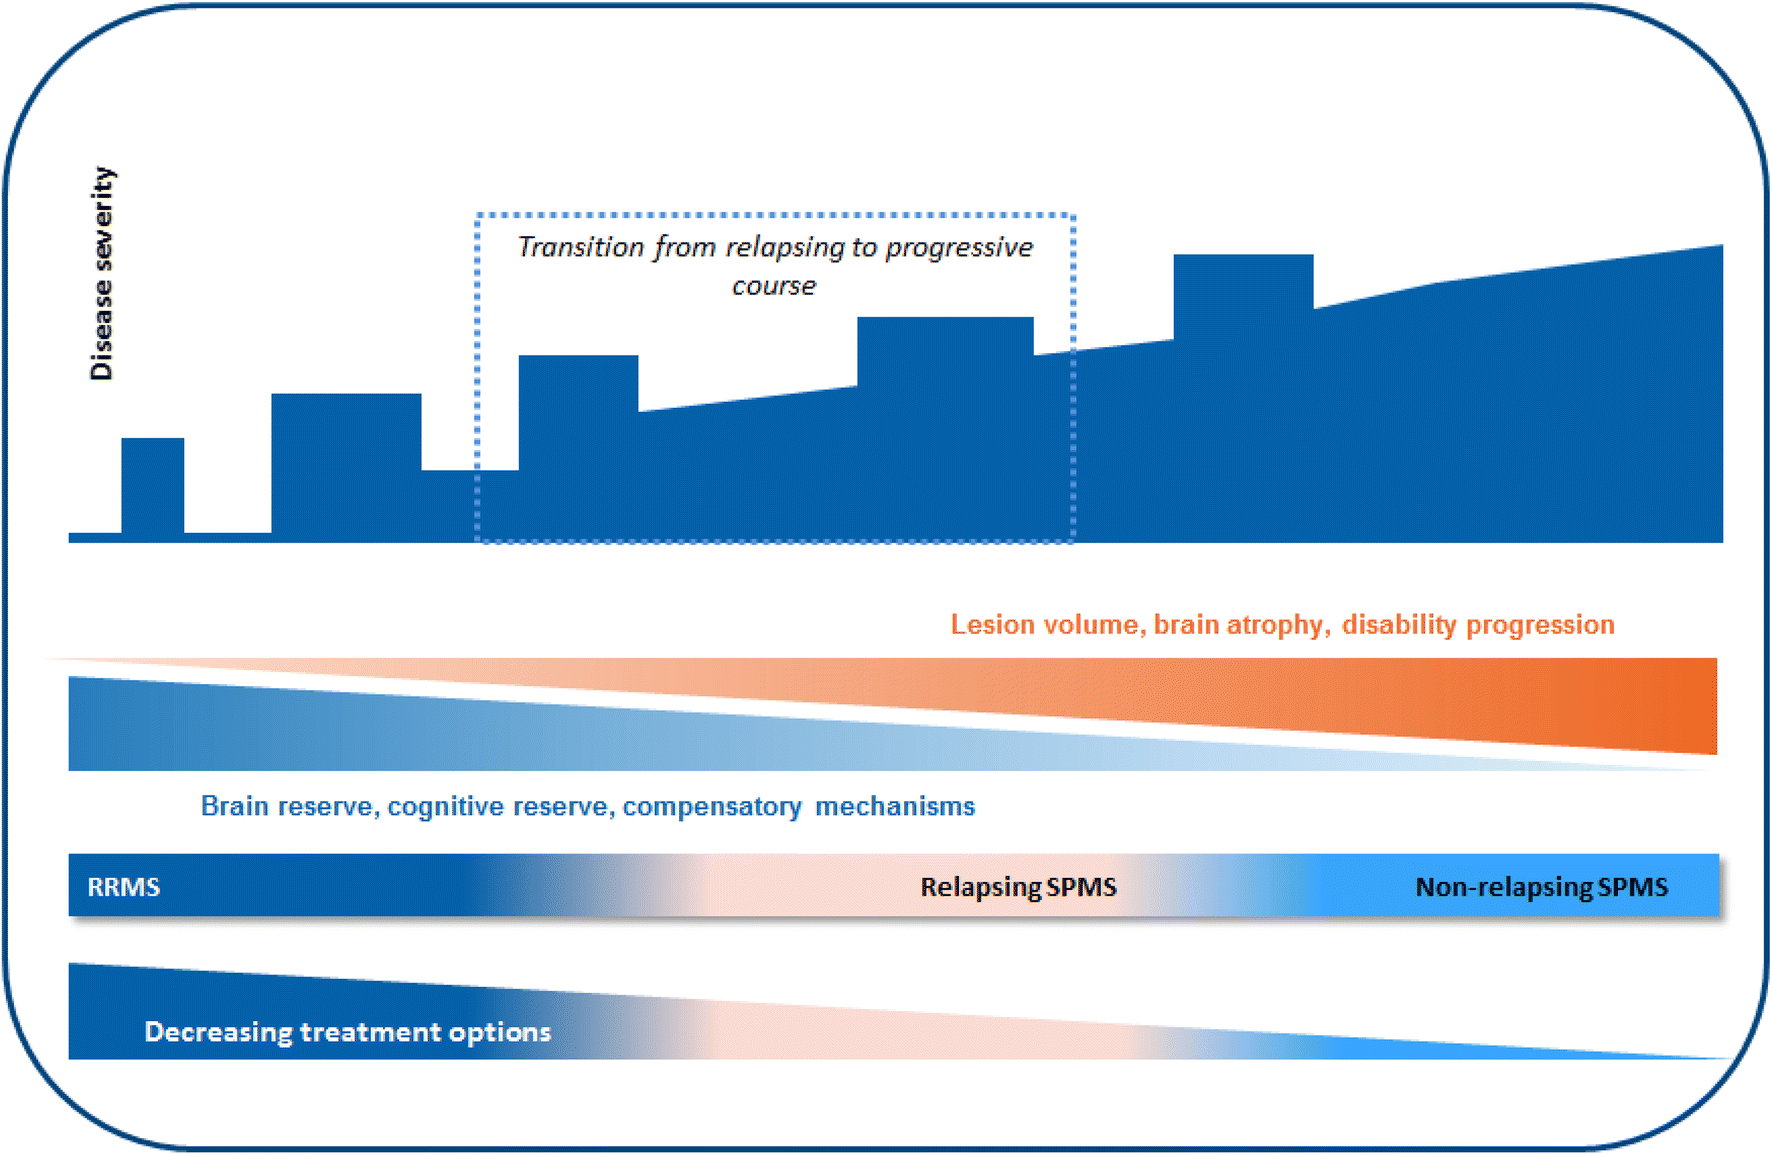 A focus on secondary progressive multiple sclerosis (SPMS